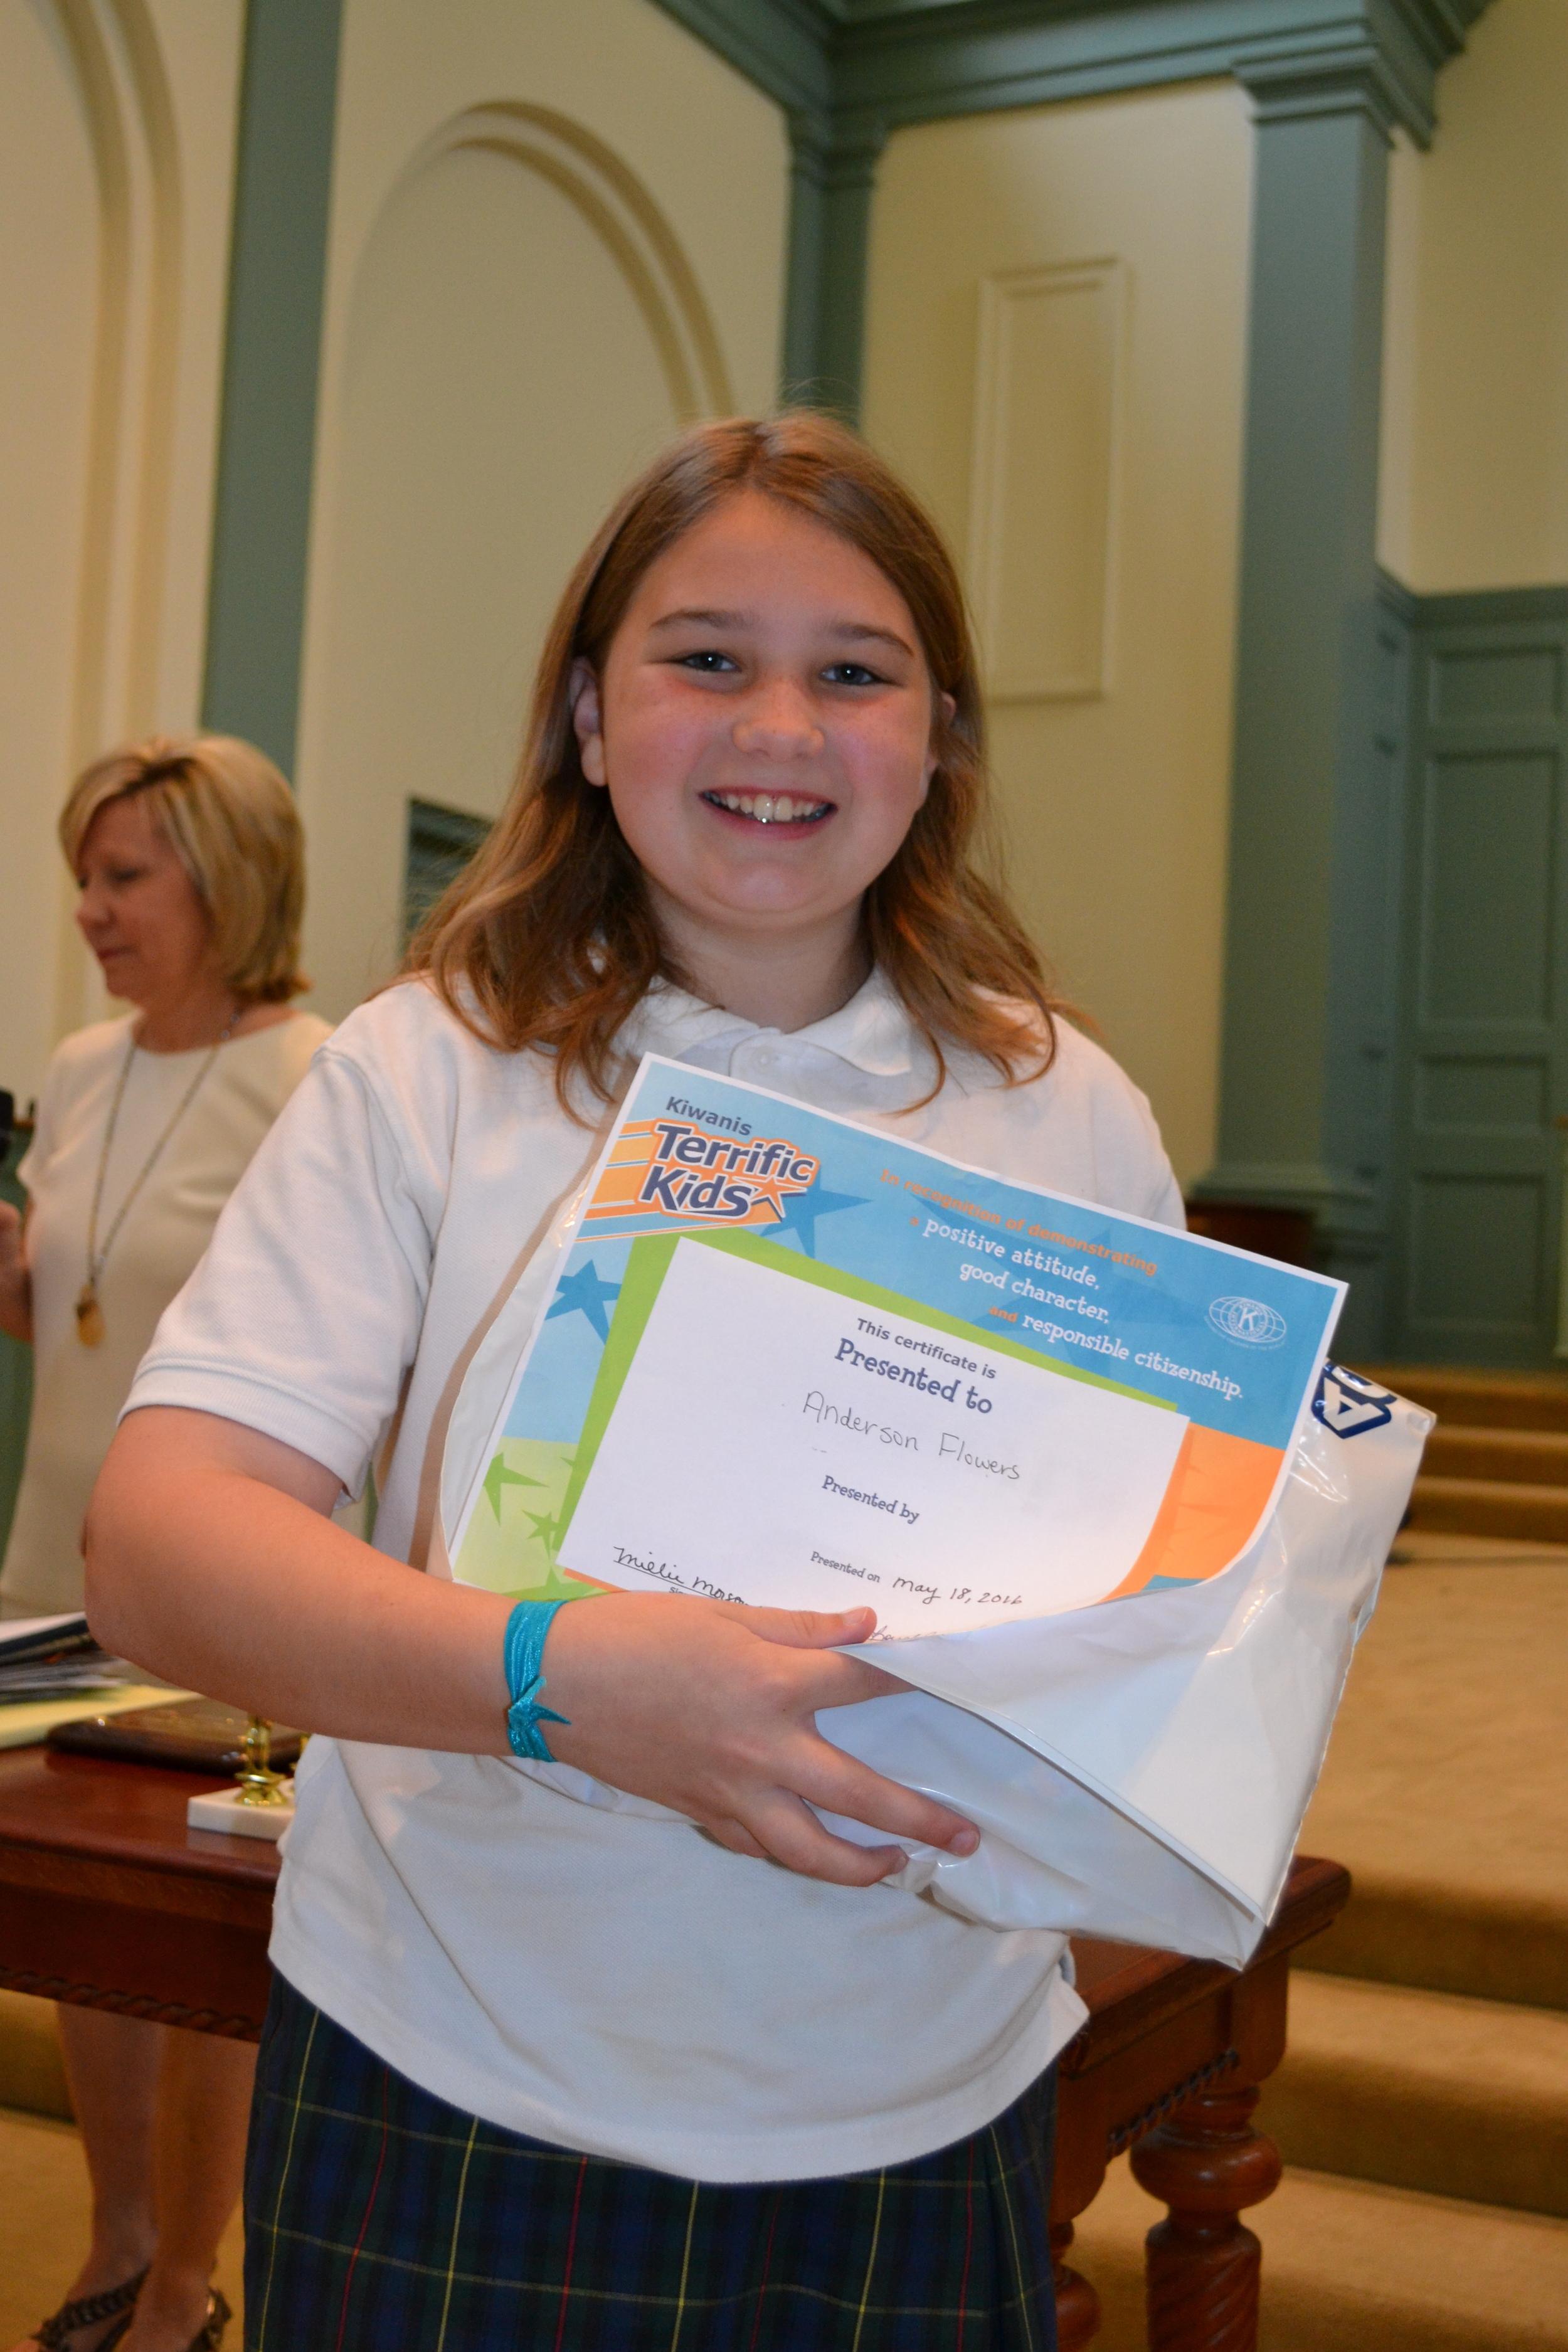 Terrific Kid Award